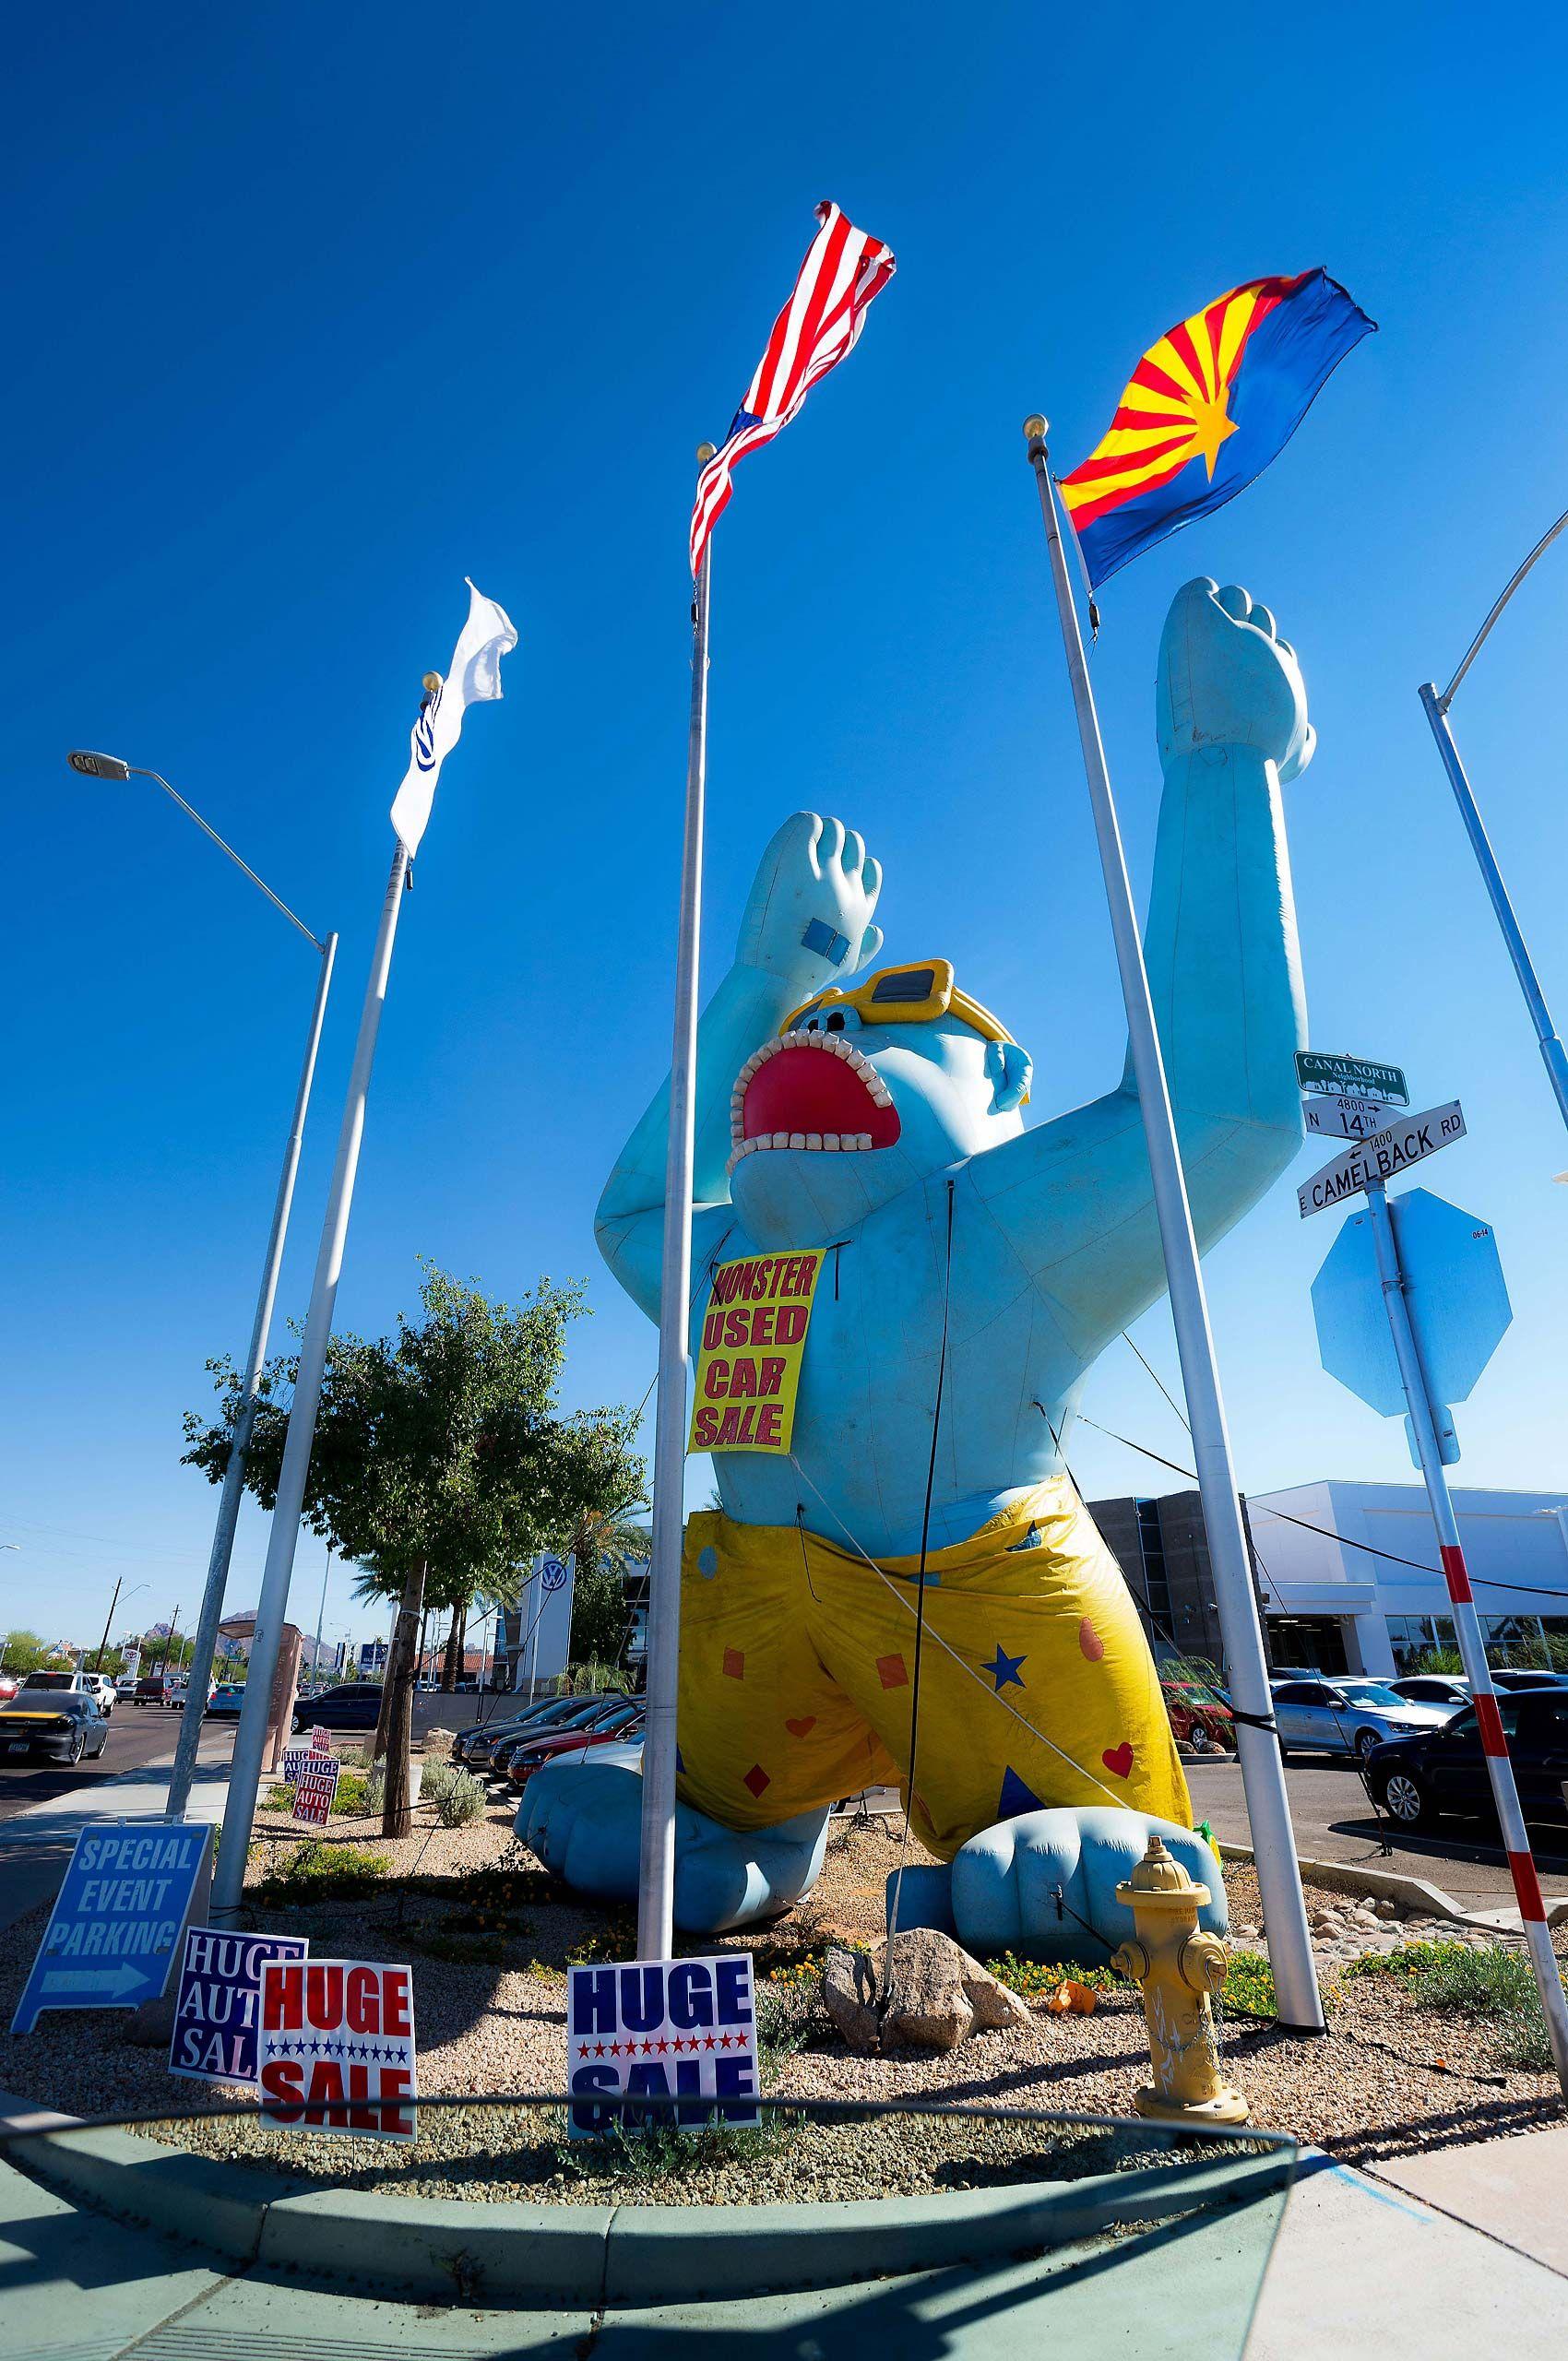 Car dealership in Pheonix  Arizona Huge Sale savings gaint inflatable blue gorilla